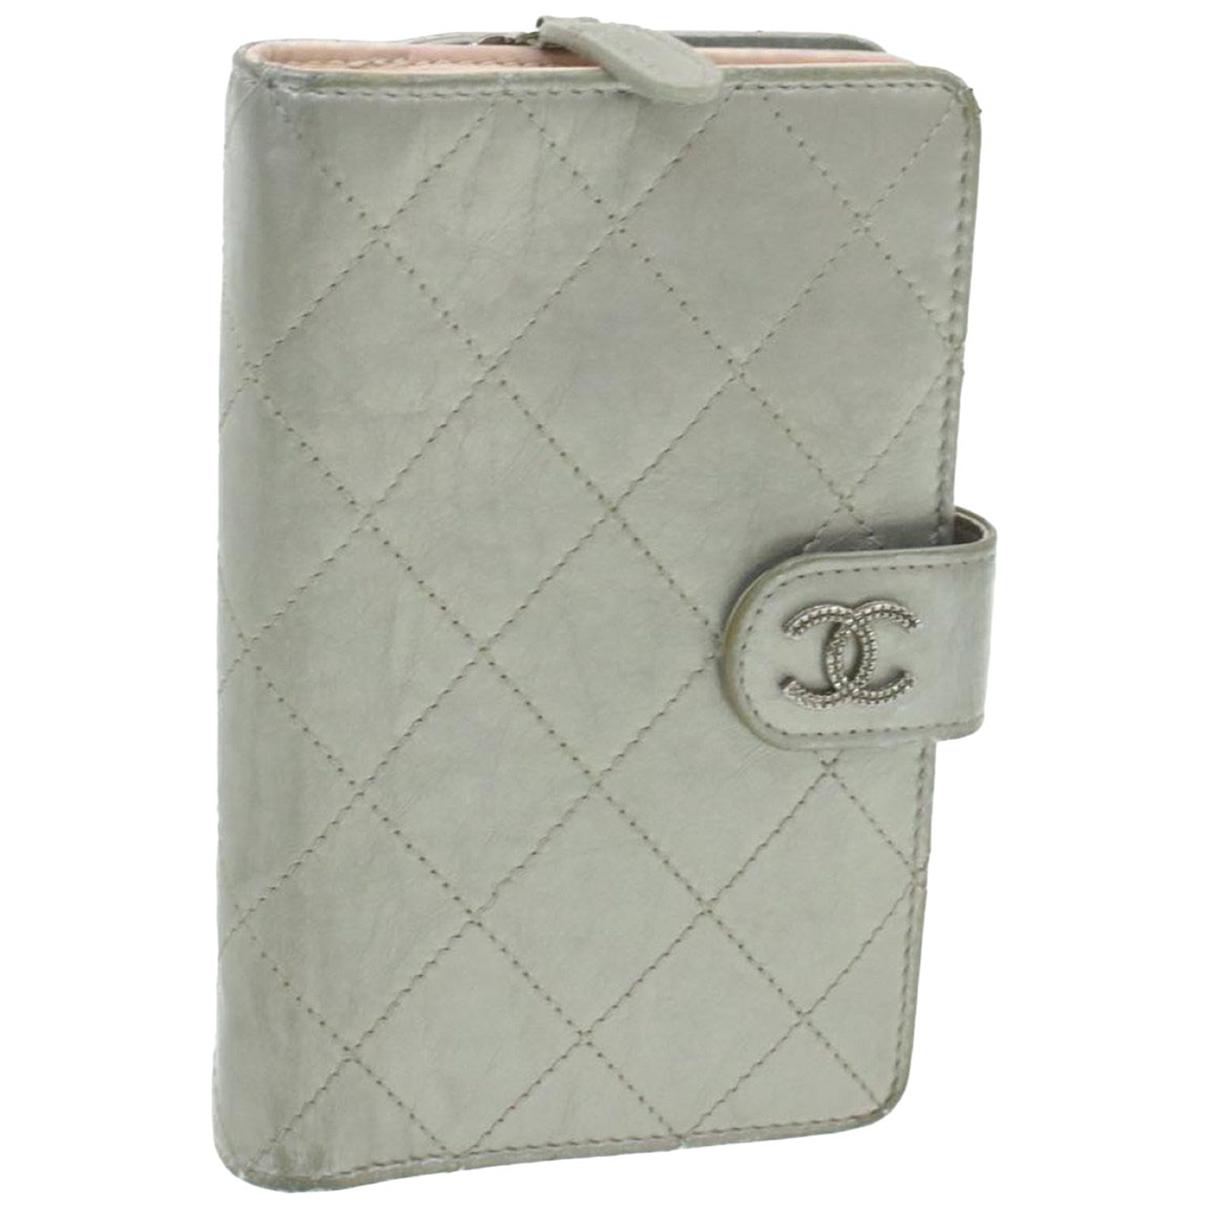 Chanel \N Schal in  Silber Synthetik